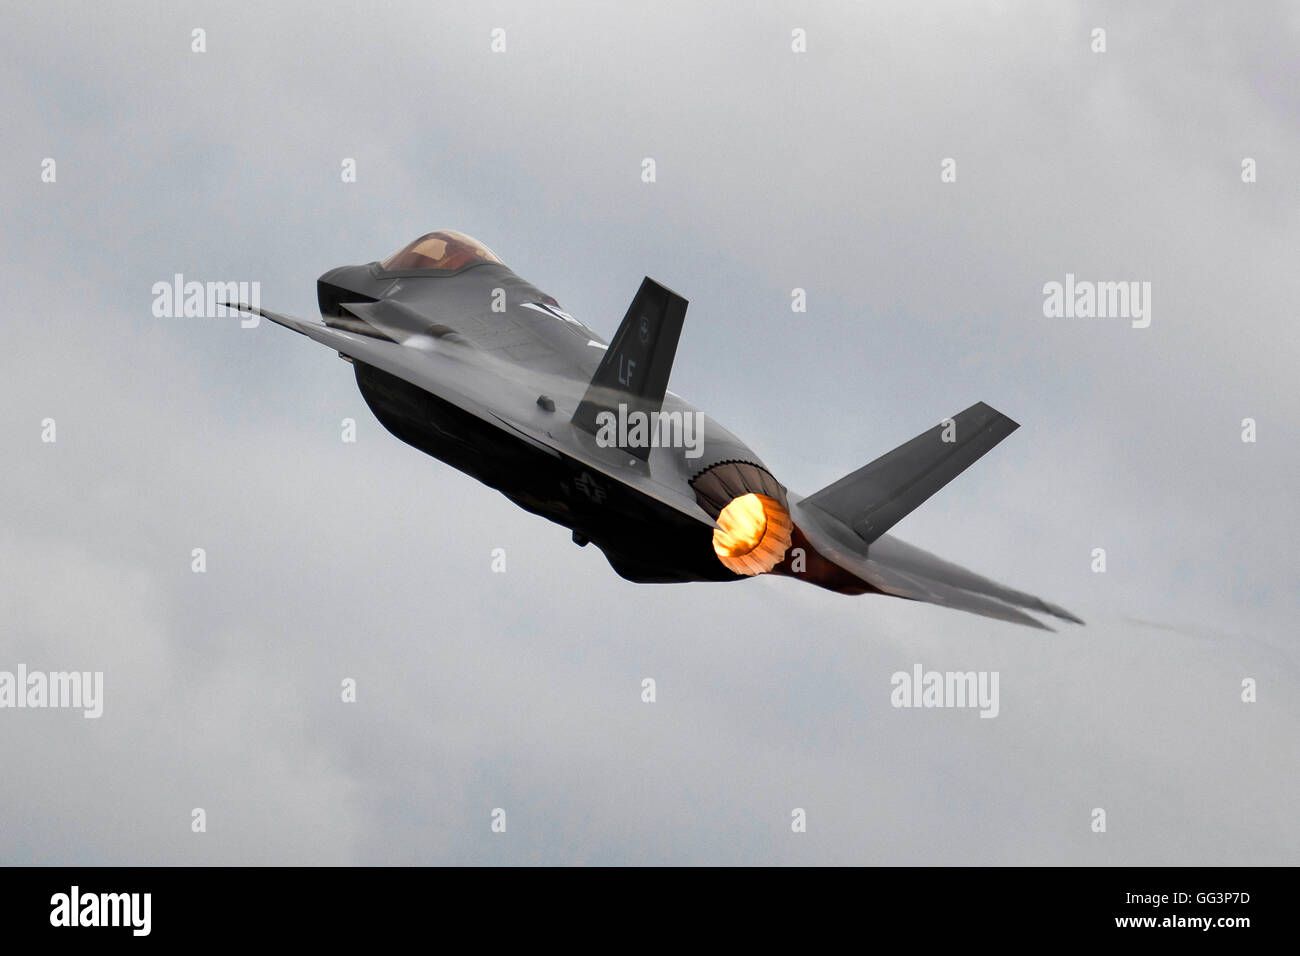 Lockheed Martin F-35 Joint Strike Fighter 'Lightning II' - Stock Image